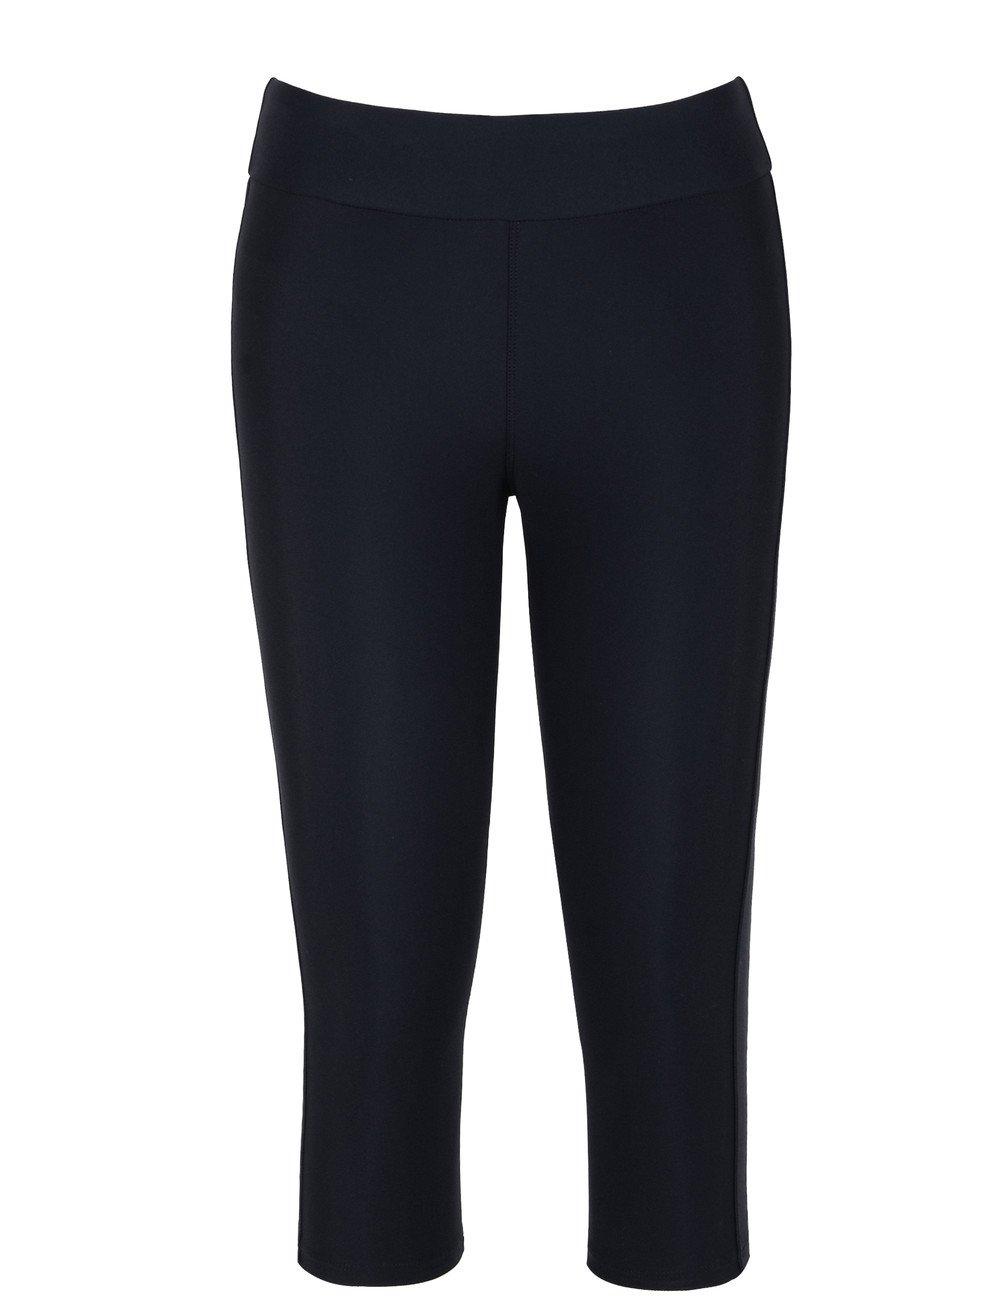 Hilor Women's UV Rash Guard Pants Crop Swim Leggings Sports Capri Tights 22 Black 1